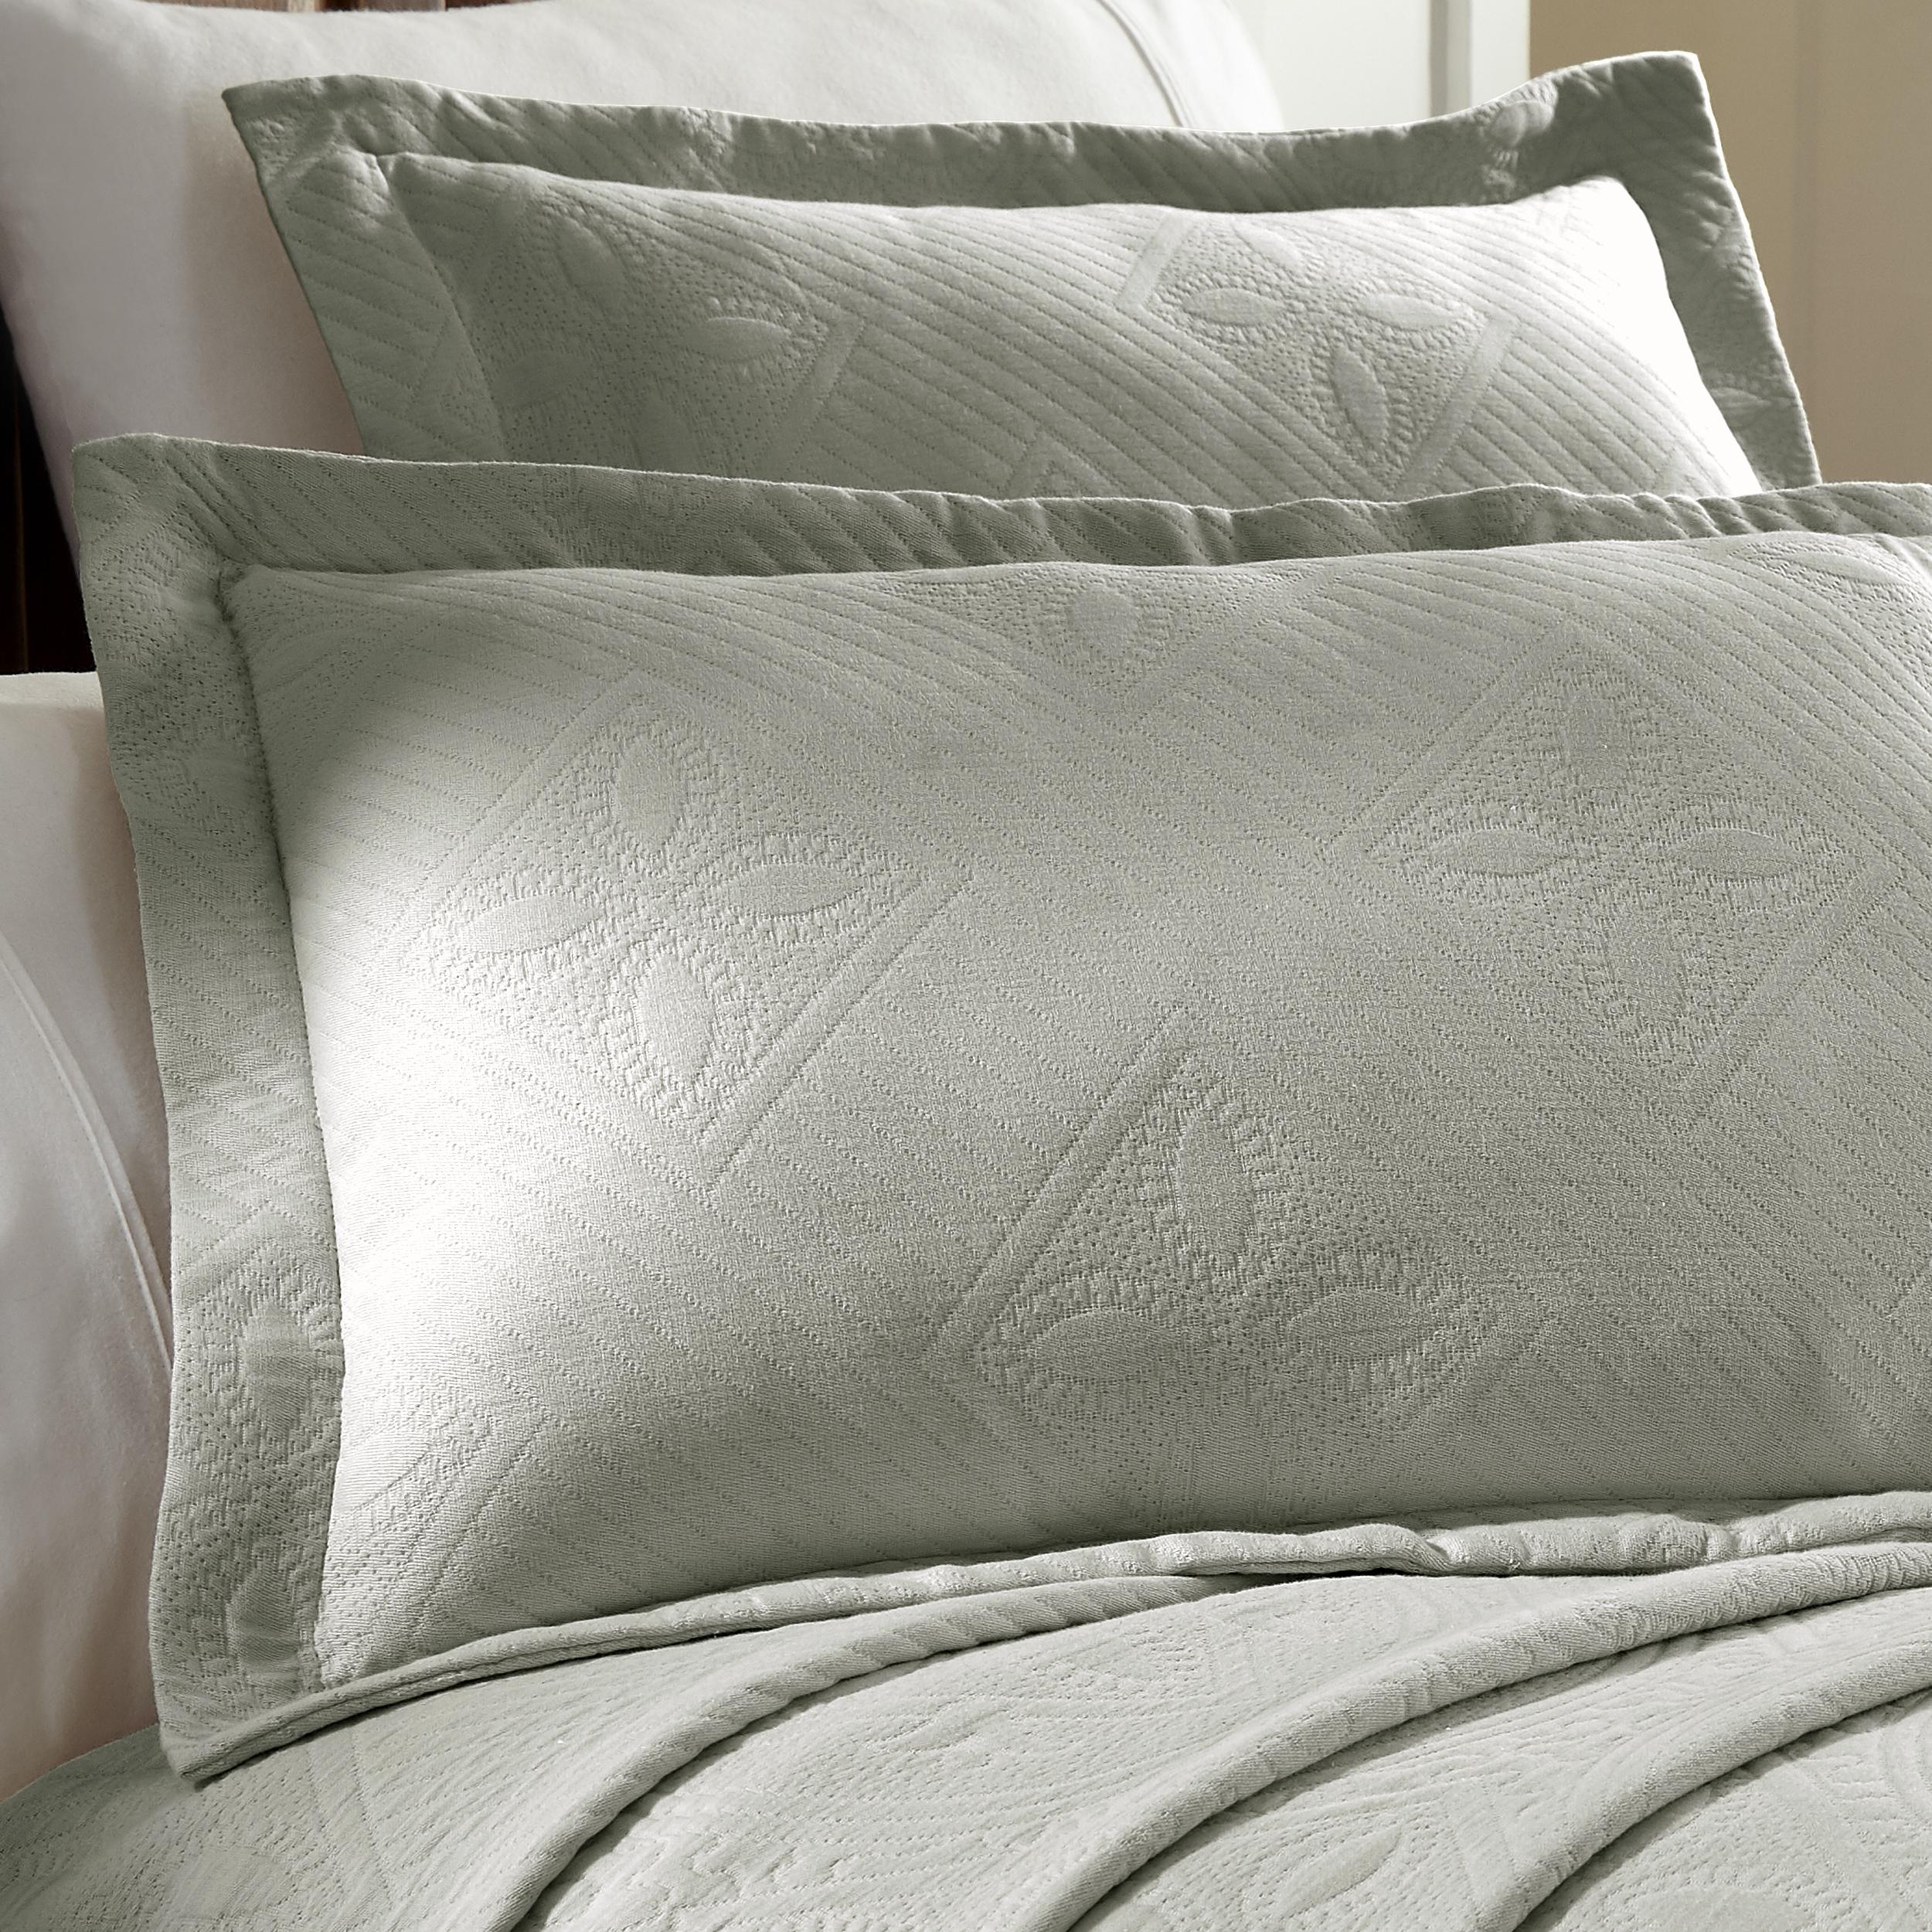 Celtic-Circle-Cotton-Jacquard-Matelasse-Scalloped-Bedspread-Set thumbnail 24